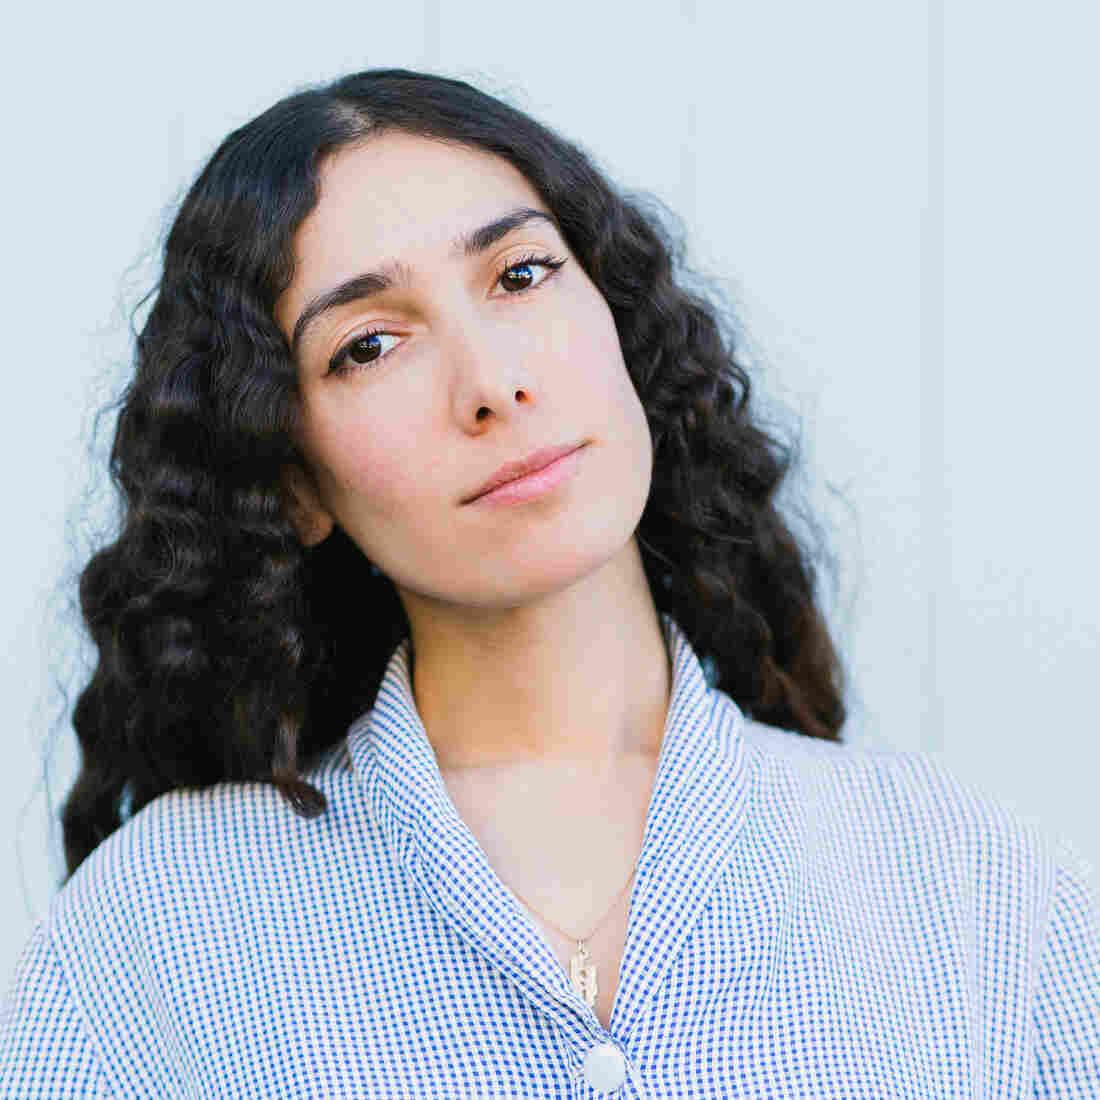 Bedouine will perform at SXSW 2019.